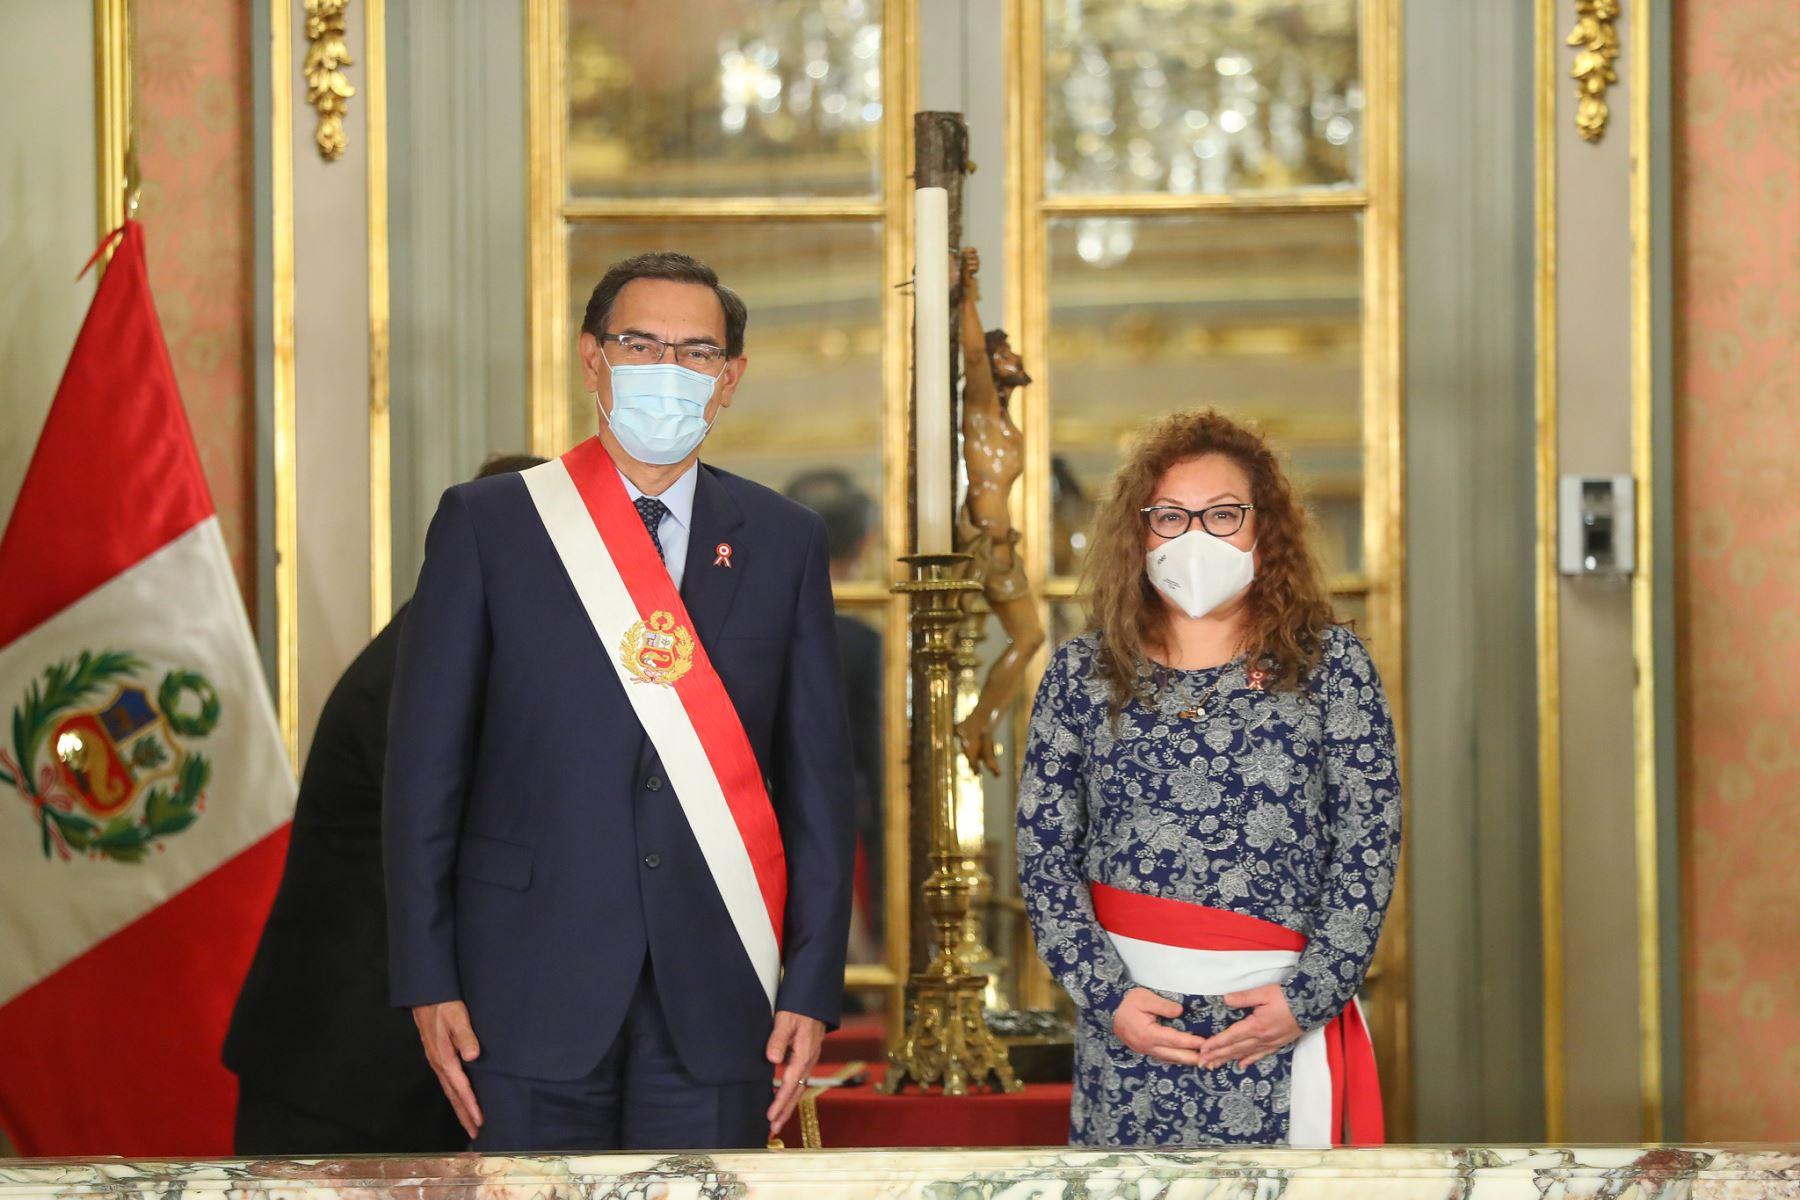 Presidente Martín Vizcarra tomó juramento de Kirla Echegaray como ministra del Ambiente. Foto: ANDINA/Presidencia